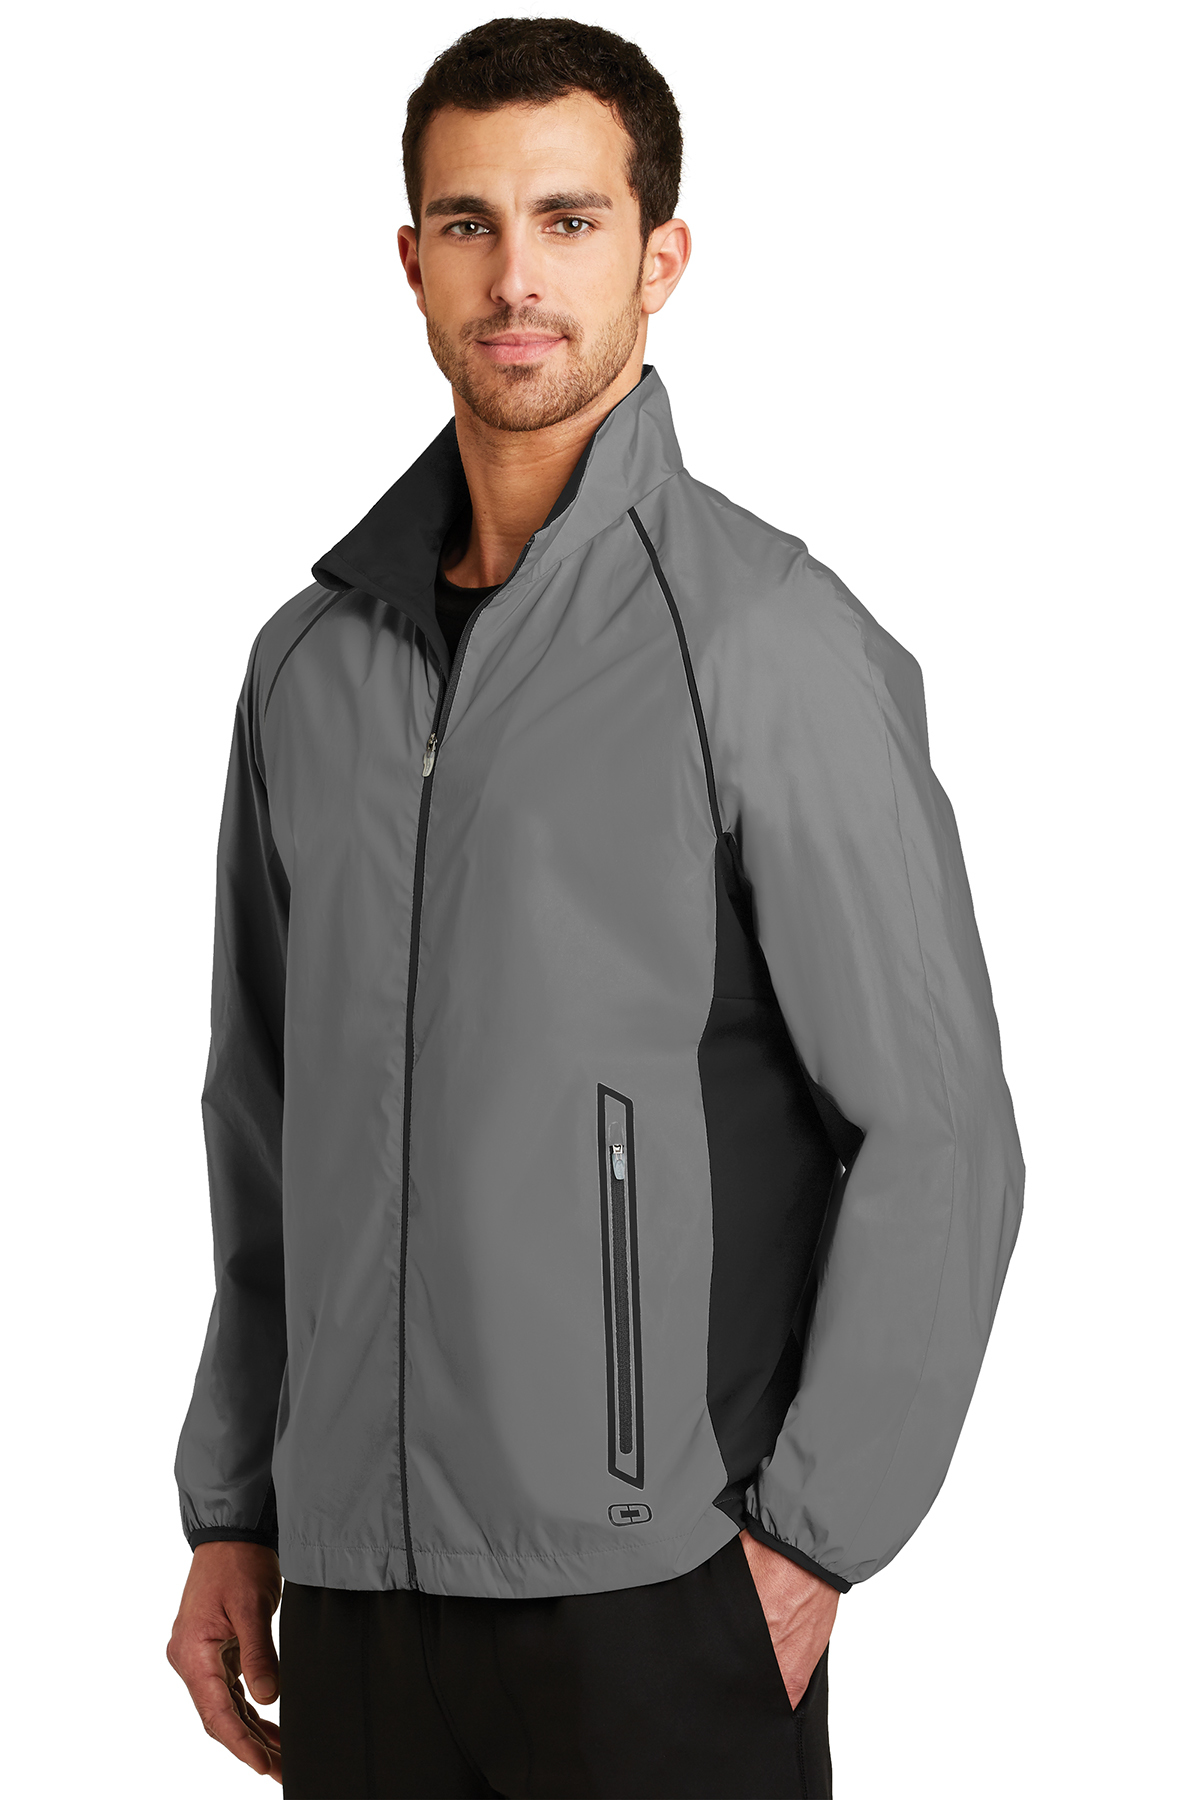 90ce31a2ac9 OGIO® ENDURANCE Flash Jacket